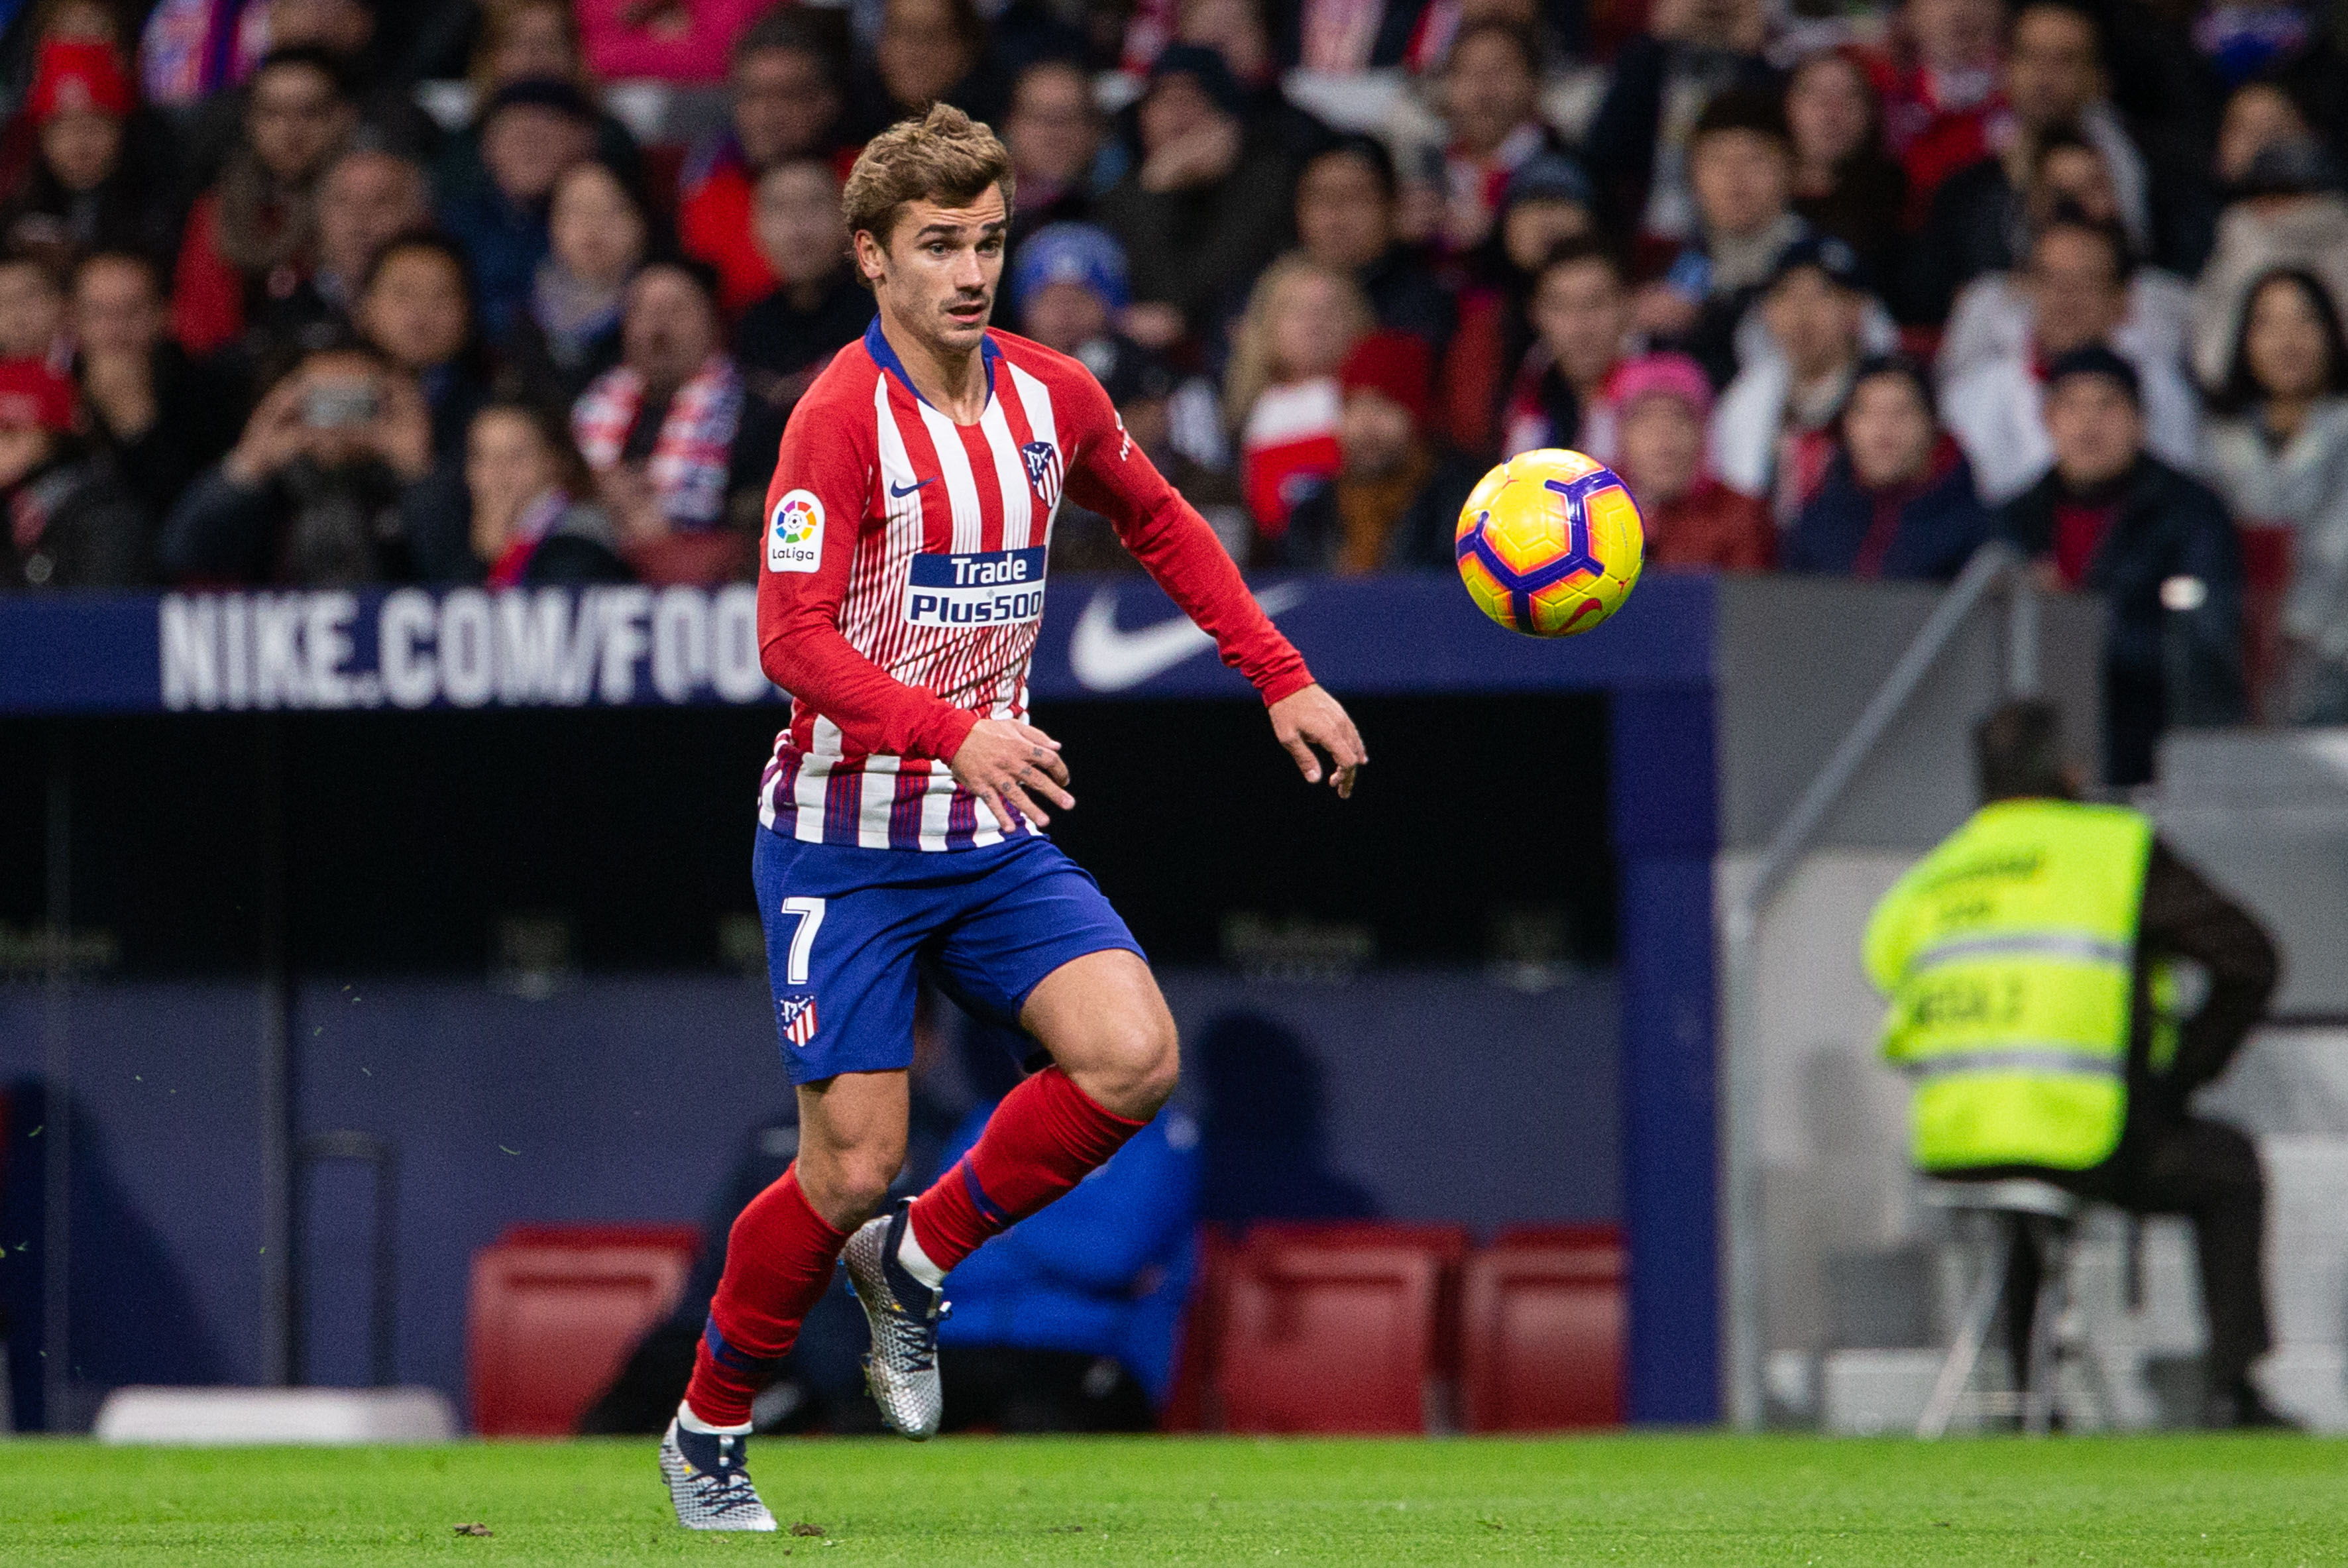 Football - Ligue des champions - Ligue des champions: Atlético Madrid-Dortmund en direct